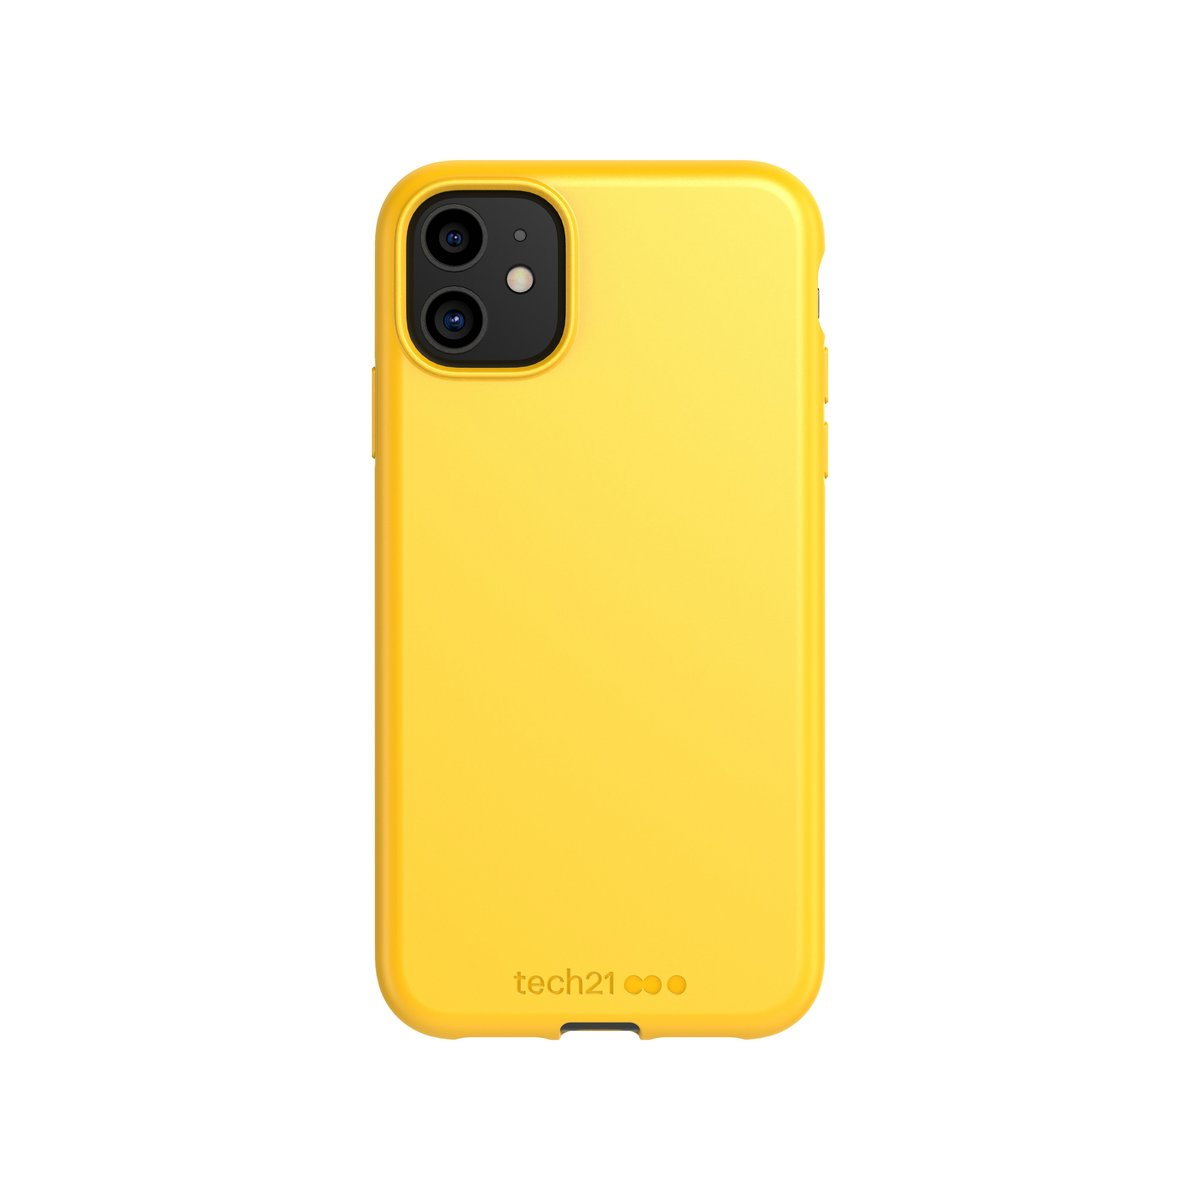 Studio Colour for iPhone 11 Pro Max - Yellow